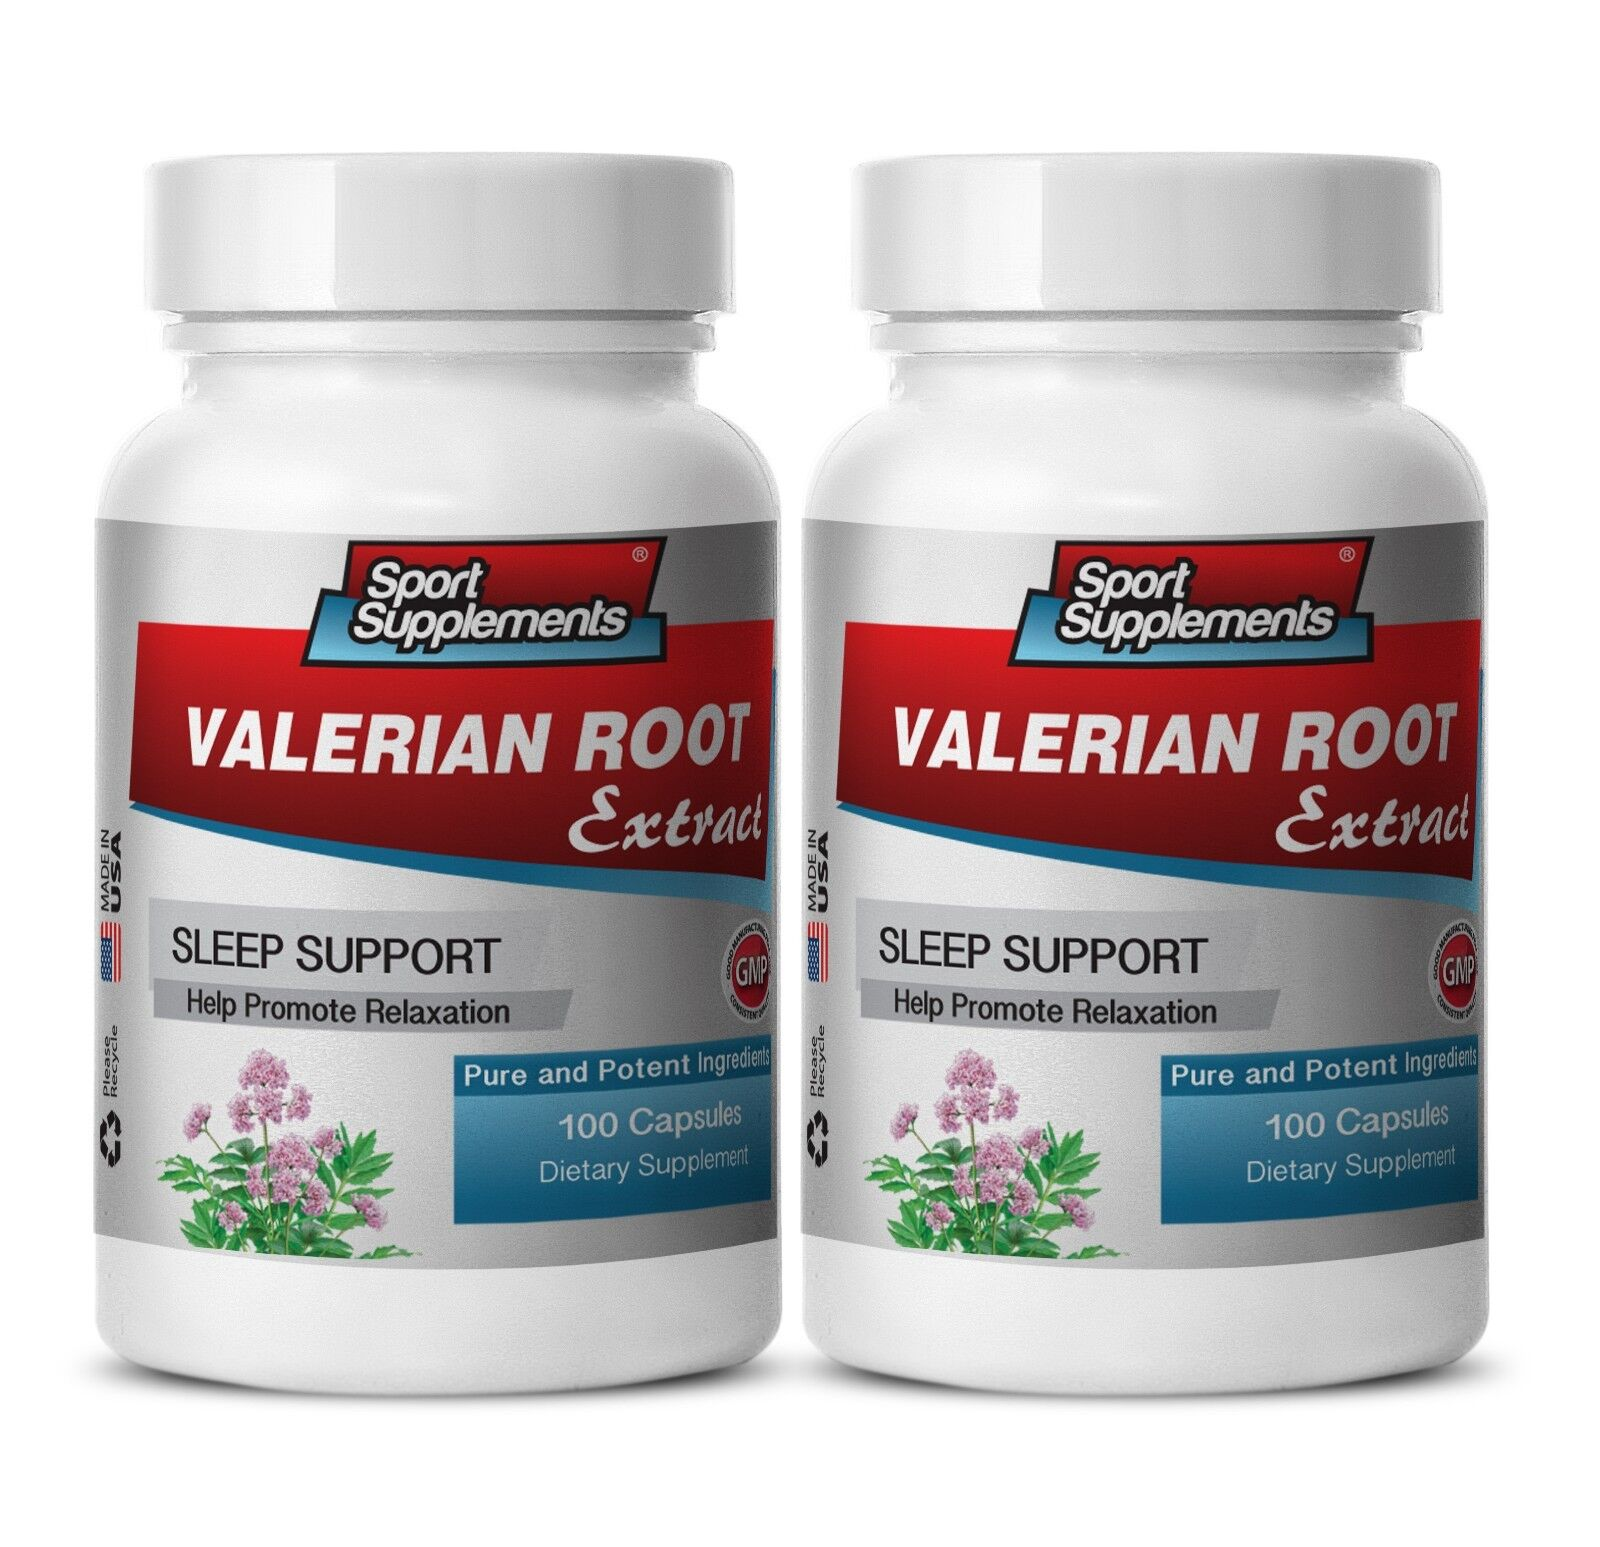 Valerian Supplements - Valerian Root Extract 4:1 125mg - Help Sleeplessness 2B 1